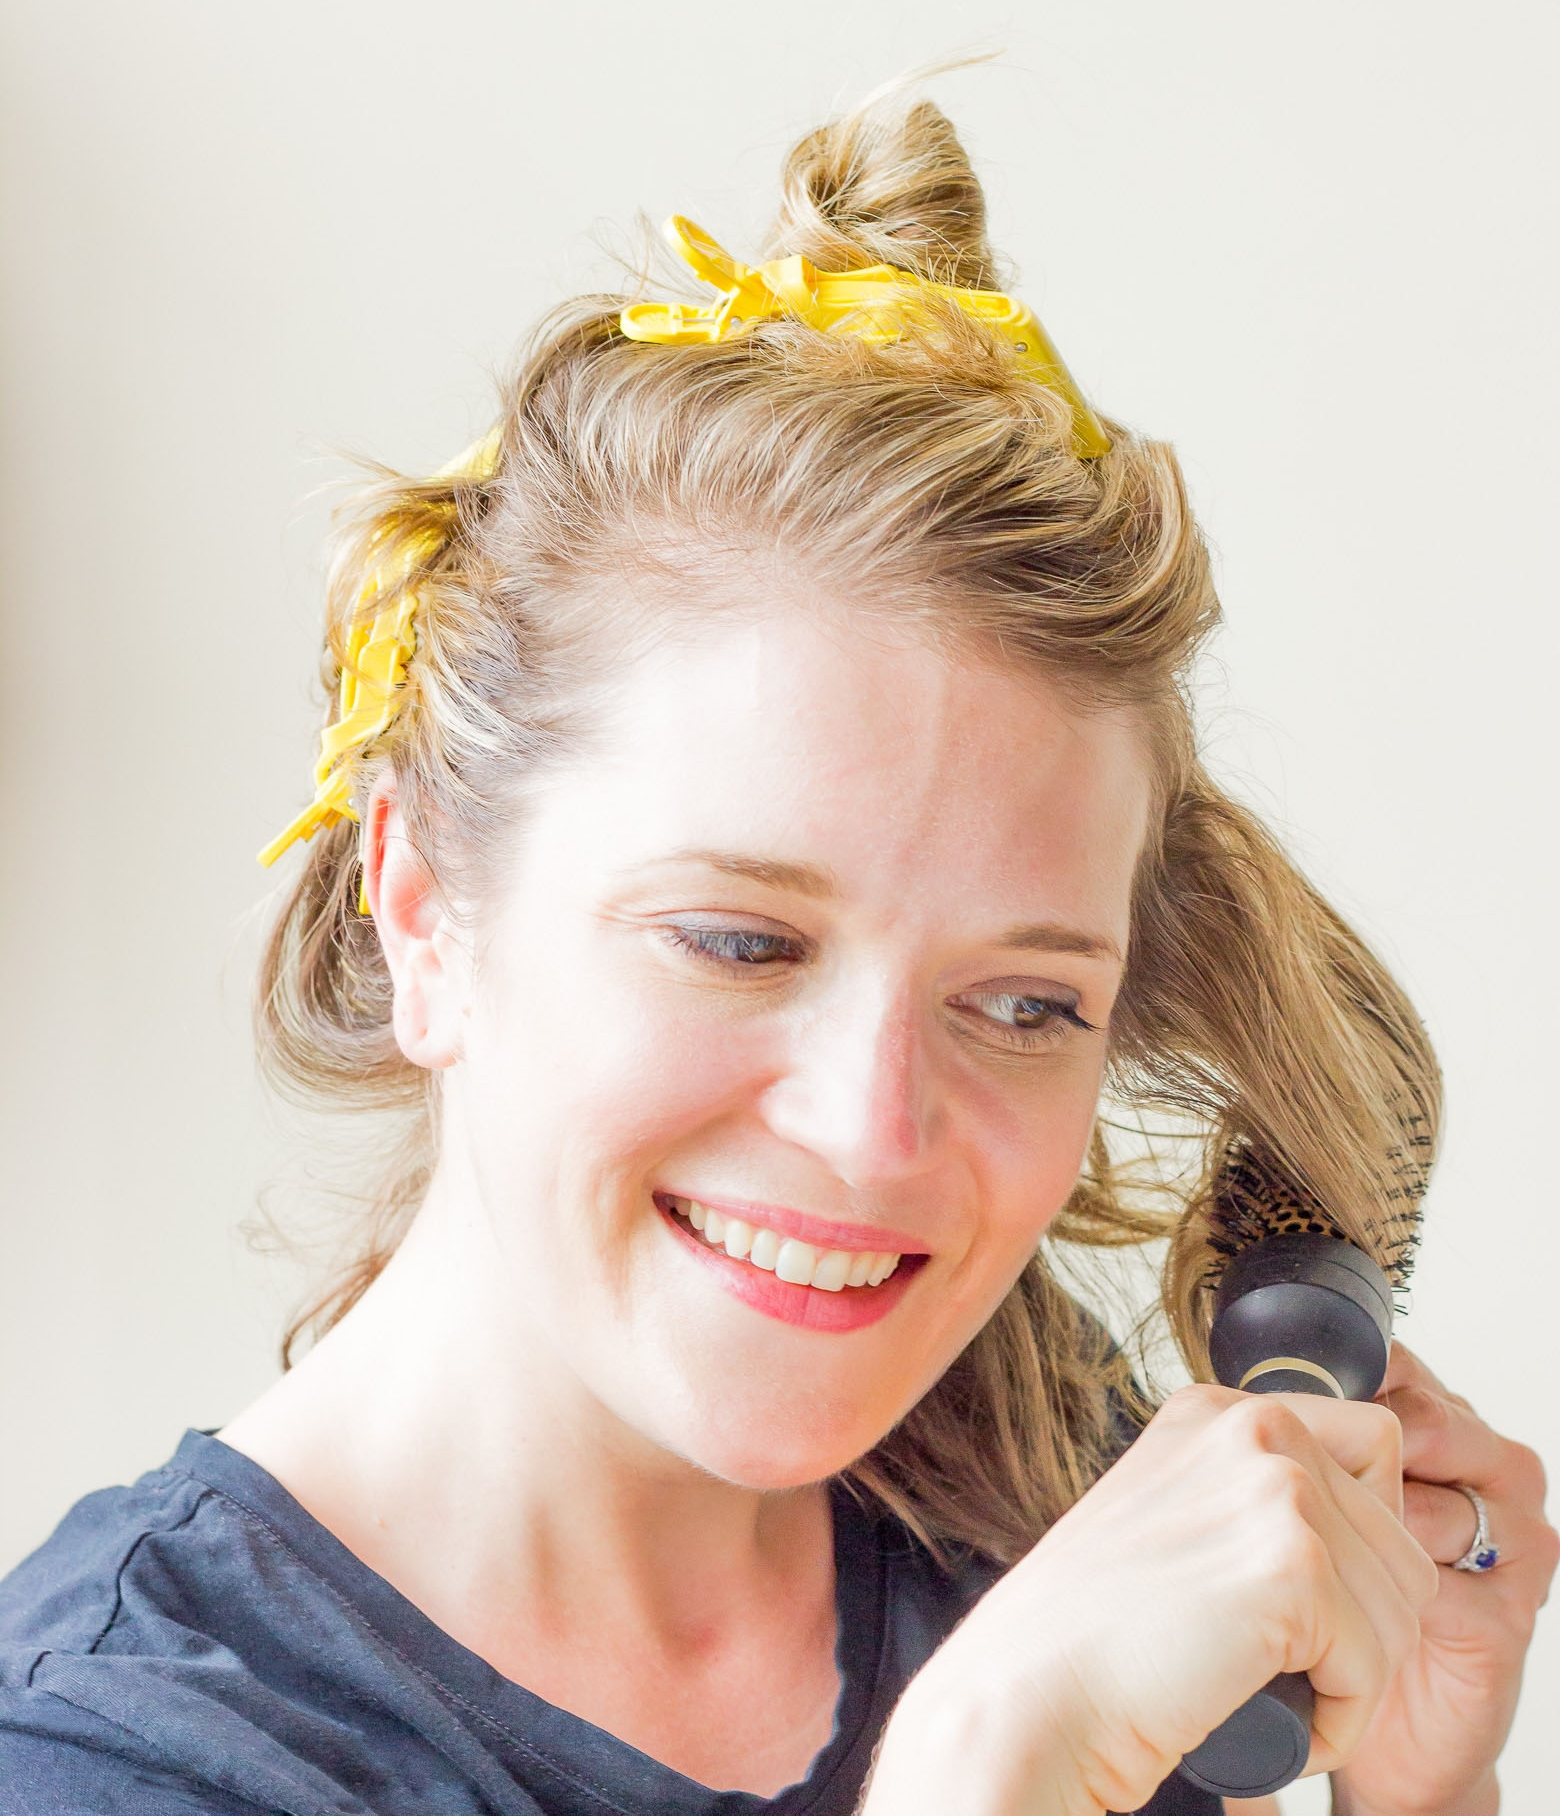 Drybar clips on Belle Meets World blog